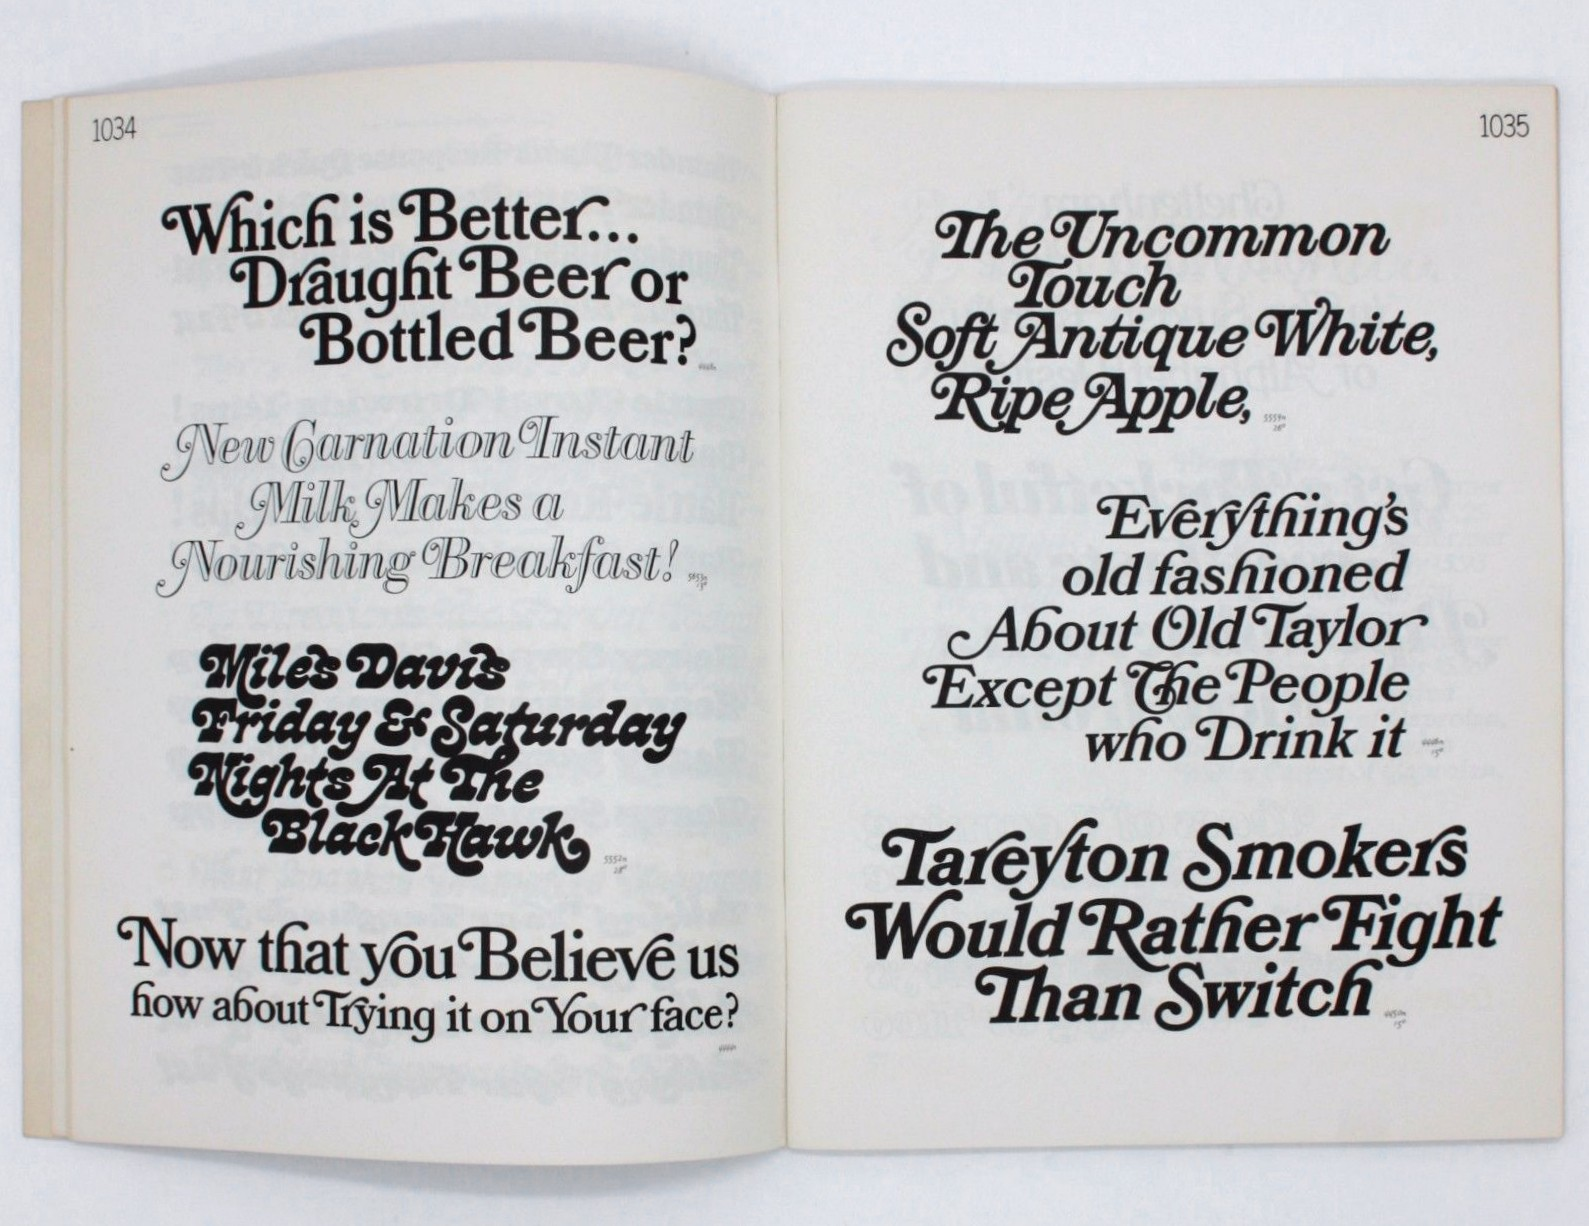 1967-alphabet-yearbook-p1034-1035.jpeg